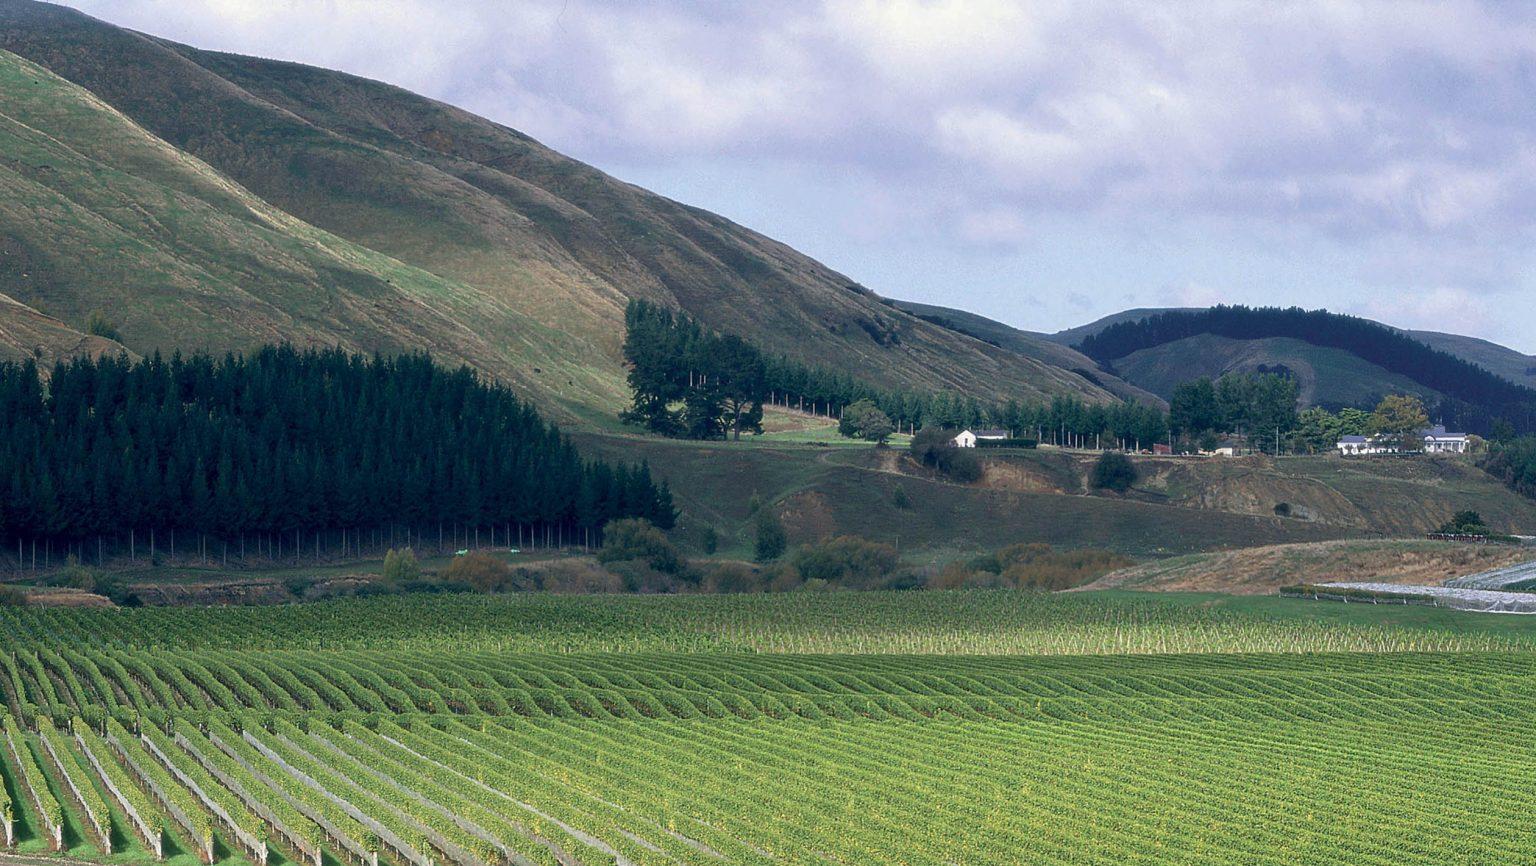 Landscape of Craggy Range vineyard in New Zealand